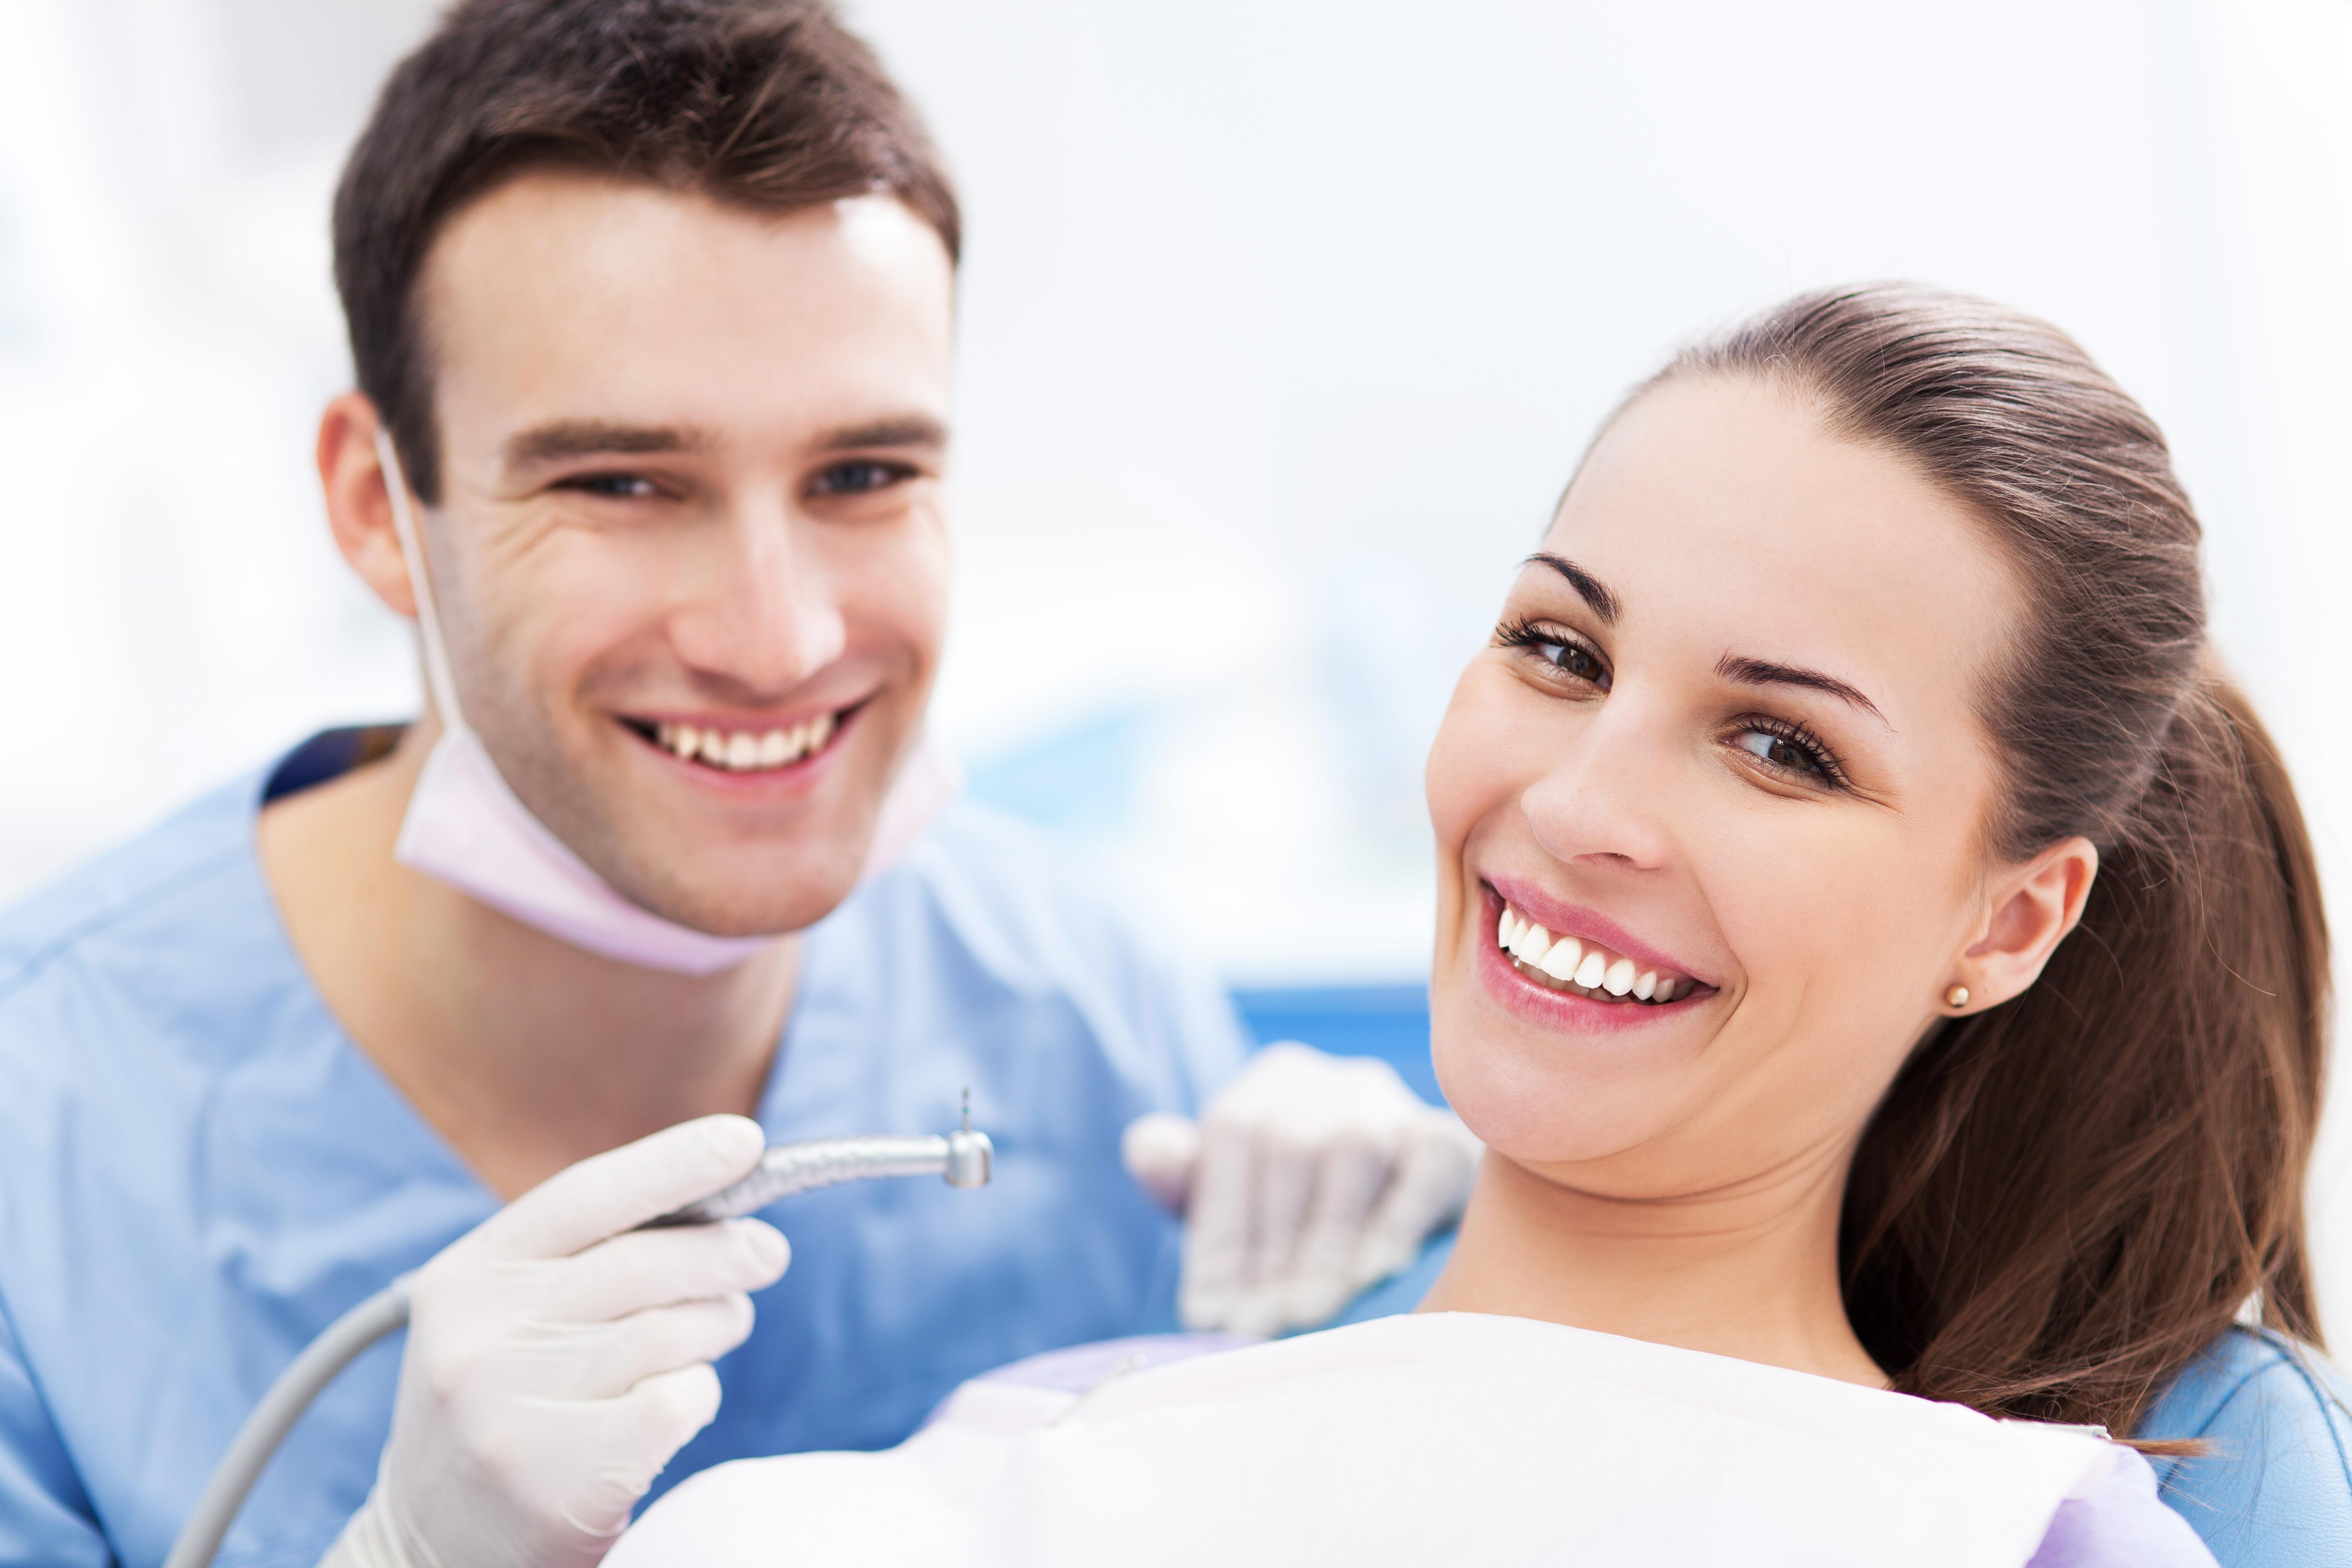 How Can I Find An Affordable Dentist Near Me? - Penn Dental